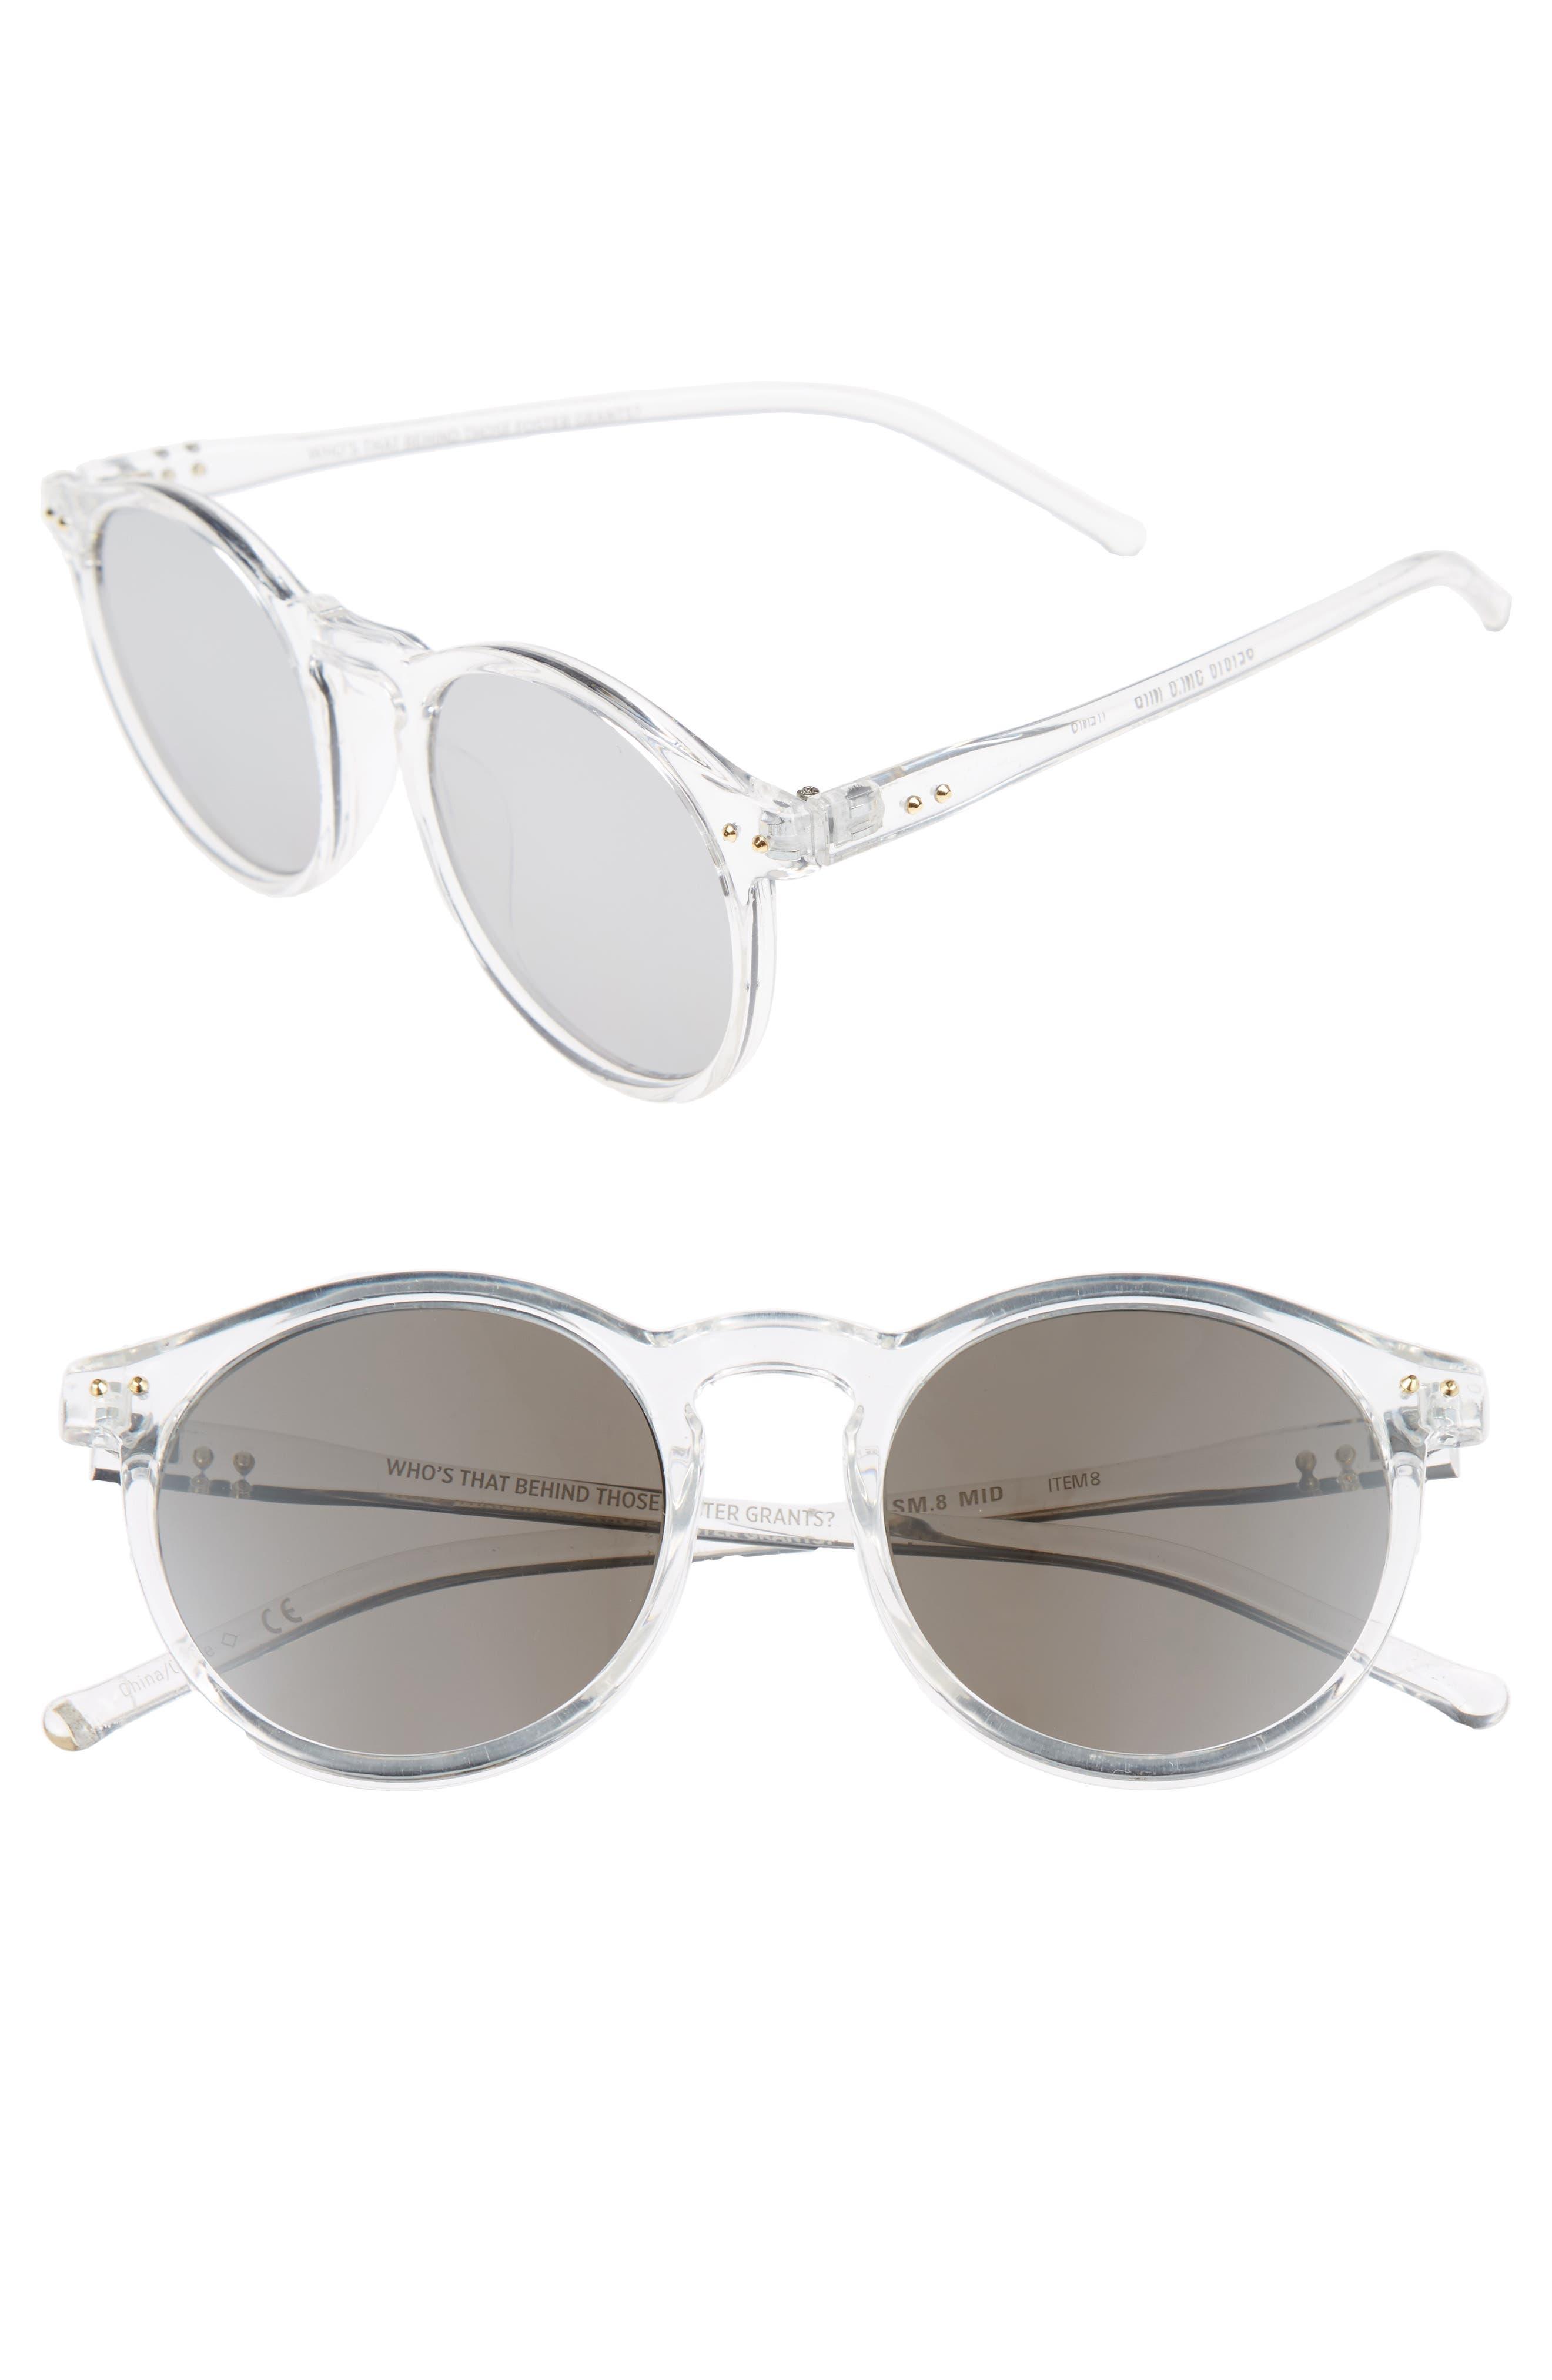 ITEM 8 SM.8 52mm Sunglasses